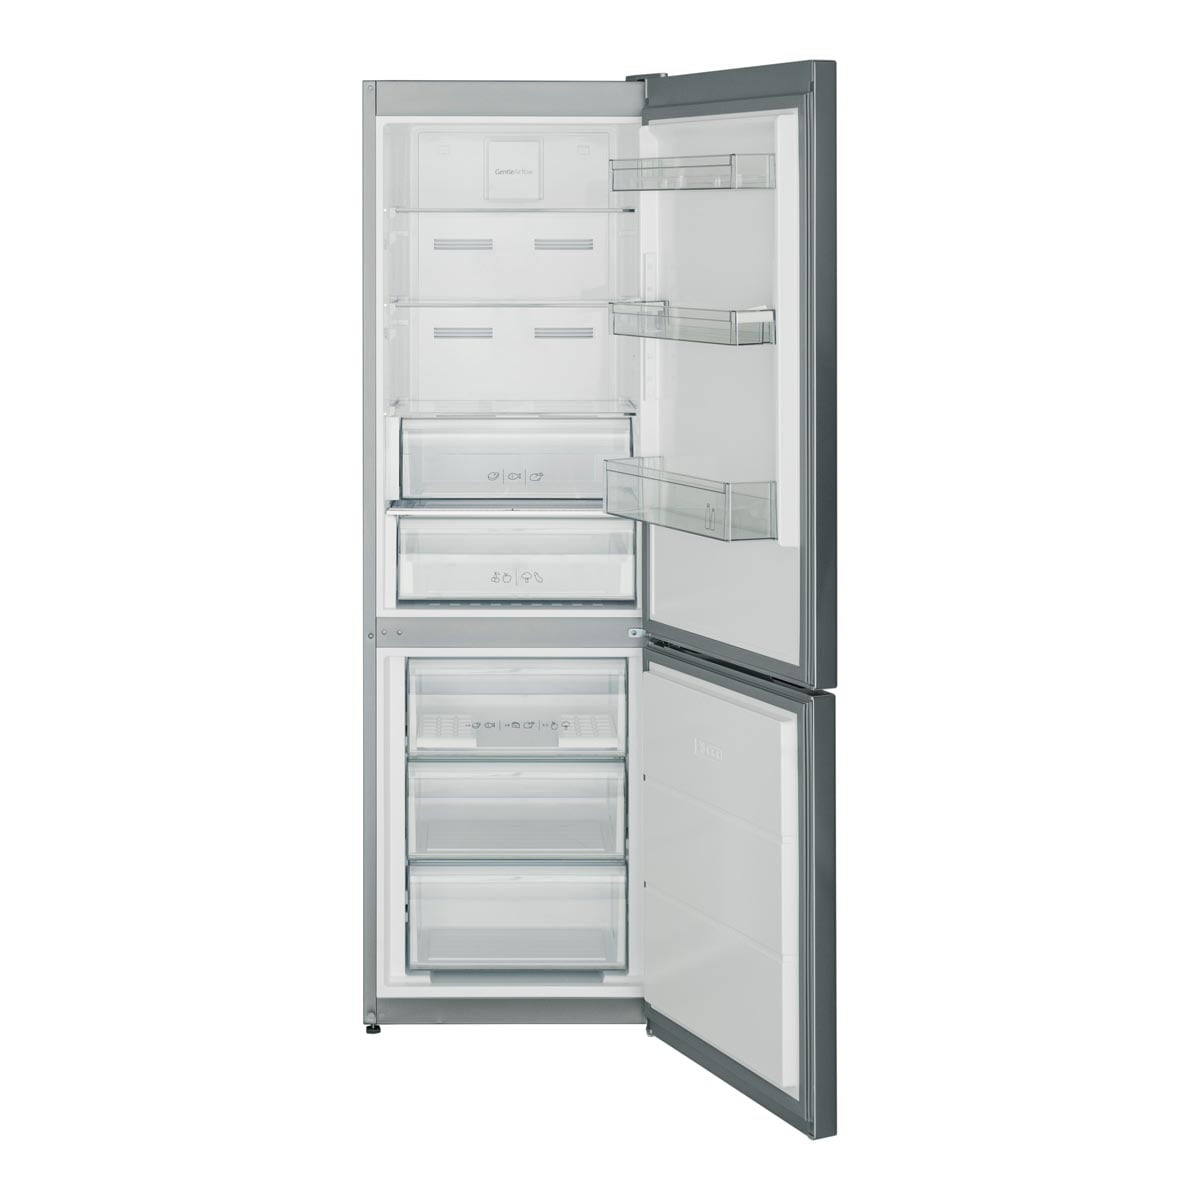 Kombinovani frižider 324 l (208+22+94) - Sharp SJ-BA10IMXI2 otvorena vrata